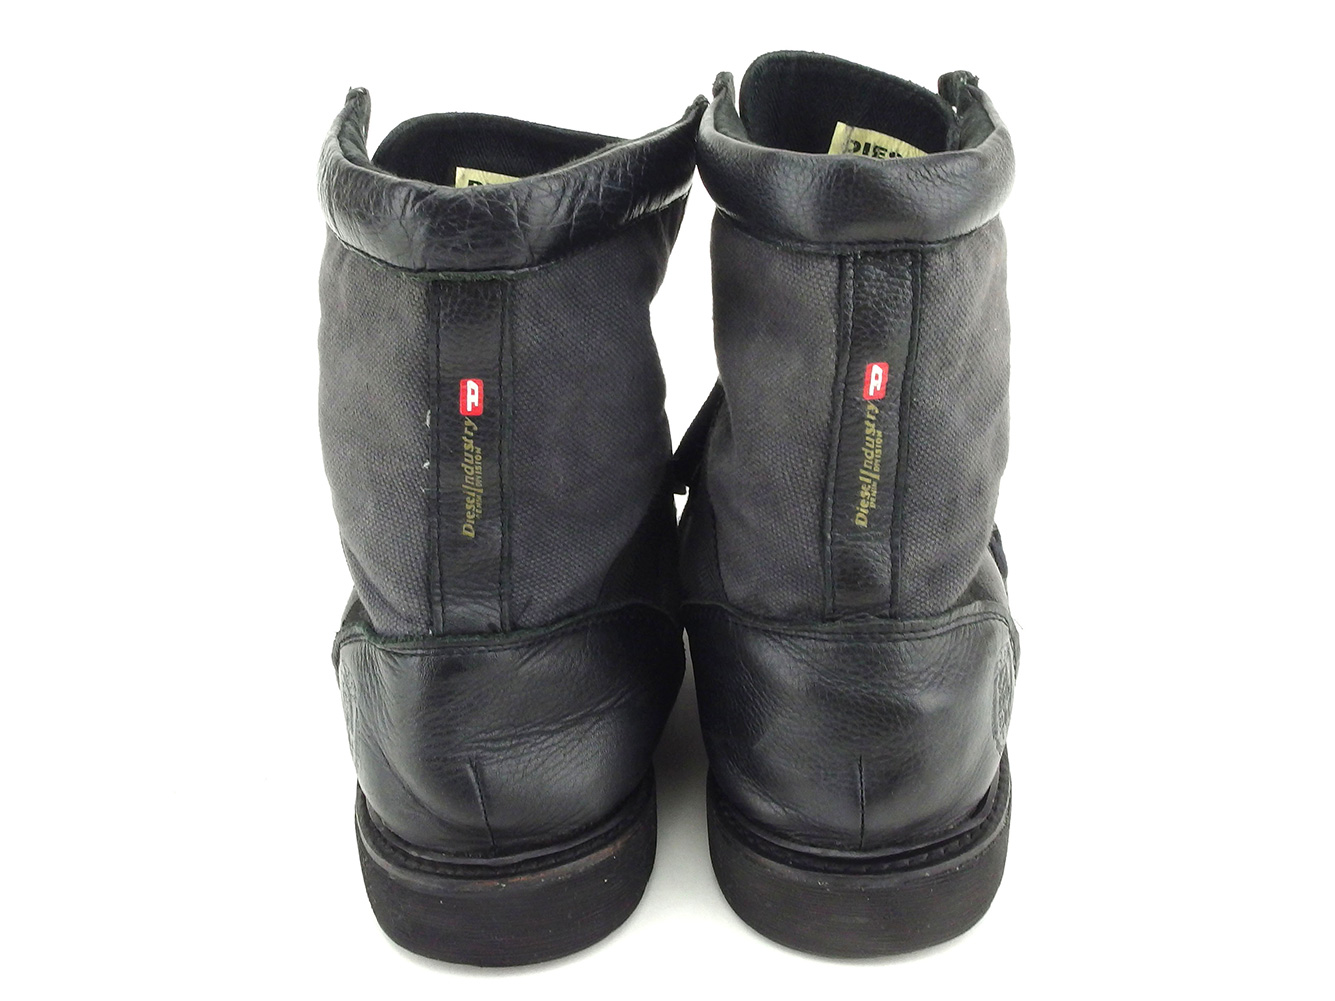 b55d70b2532c71 Knit diesel DIESEL boots shoes shoes  men s  28 black gray gray canvas X  leather popularity sale B983